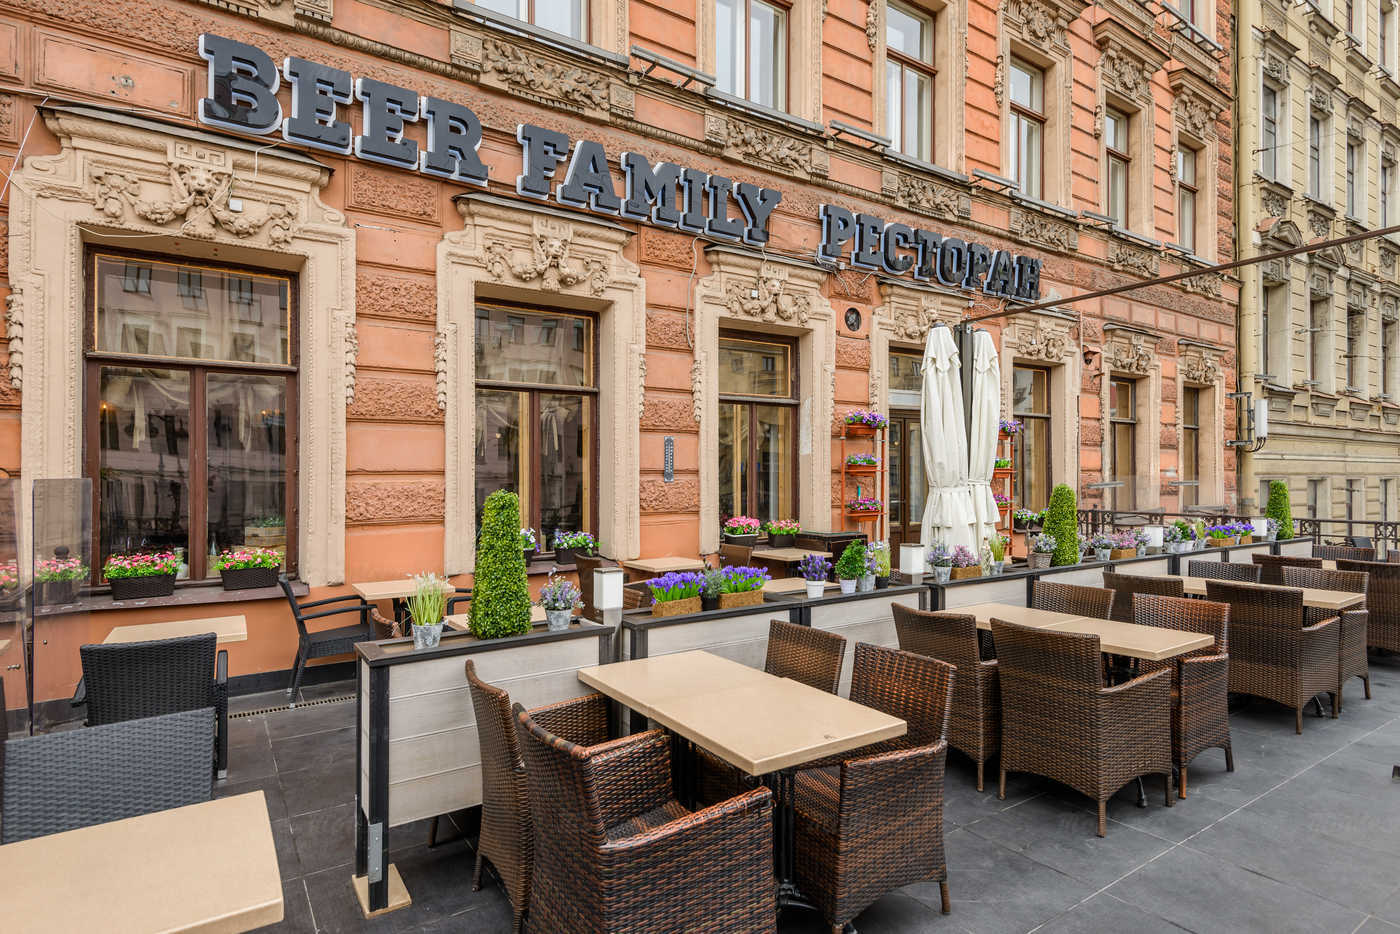 Ресторан Шато Винтаж (Chateau Vintage) на Невском проспекте фото 22